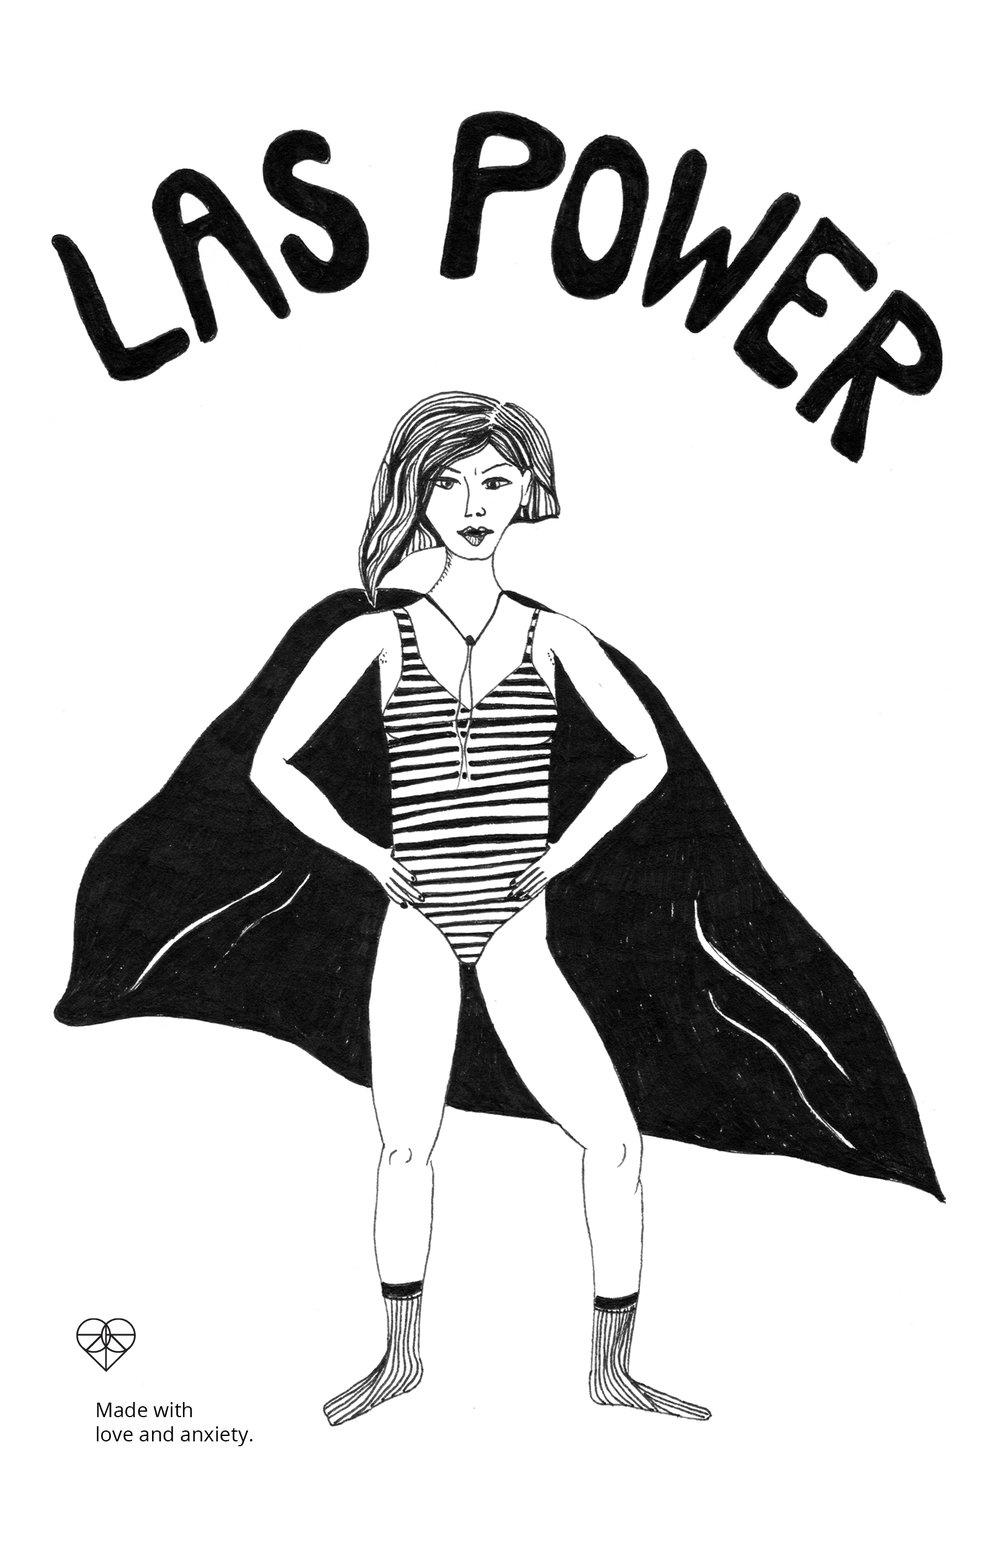 LasPower13.jpg